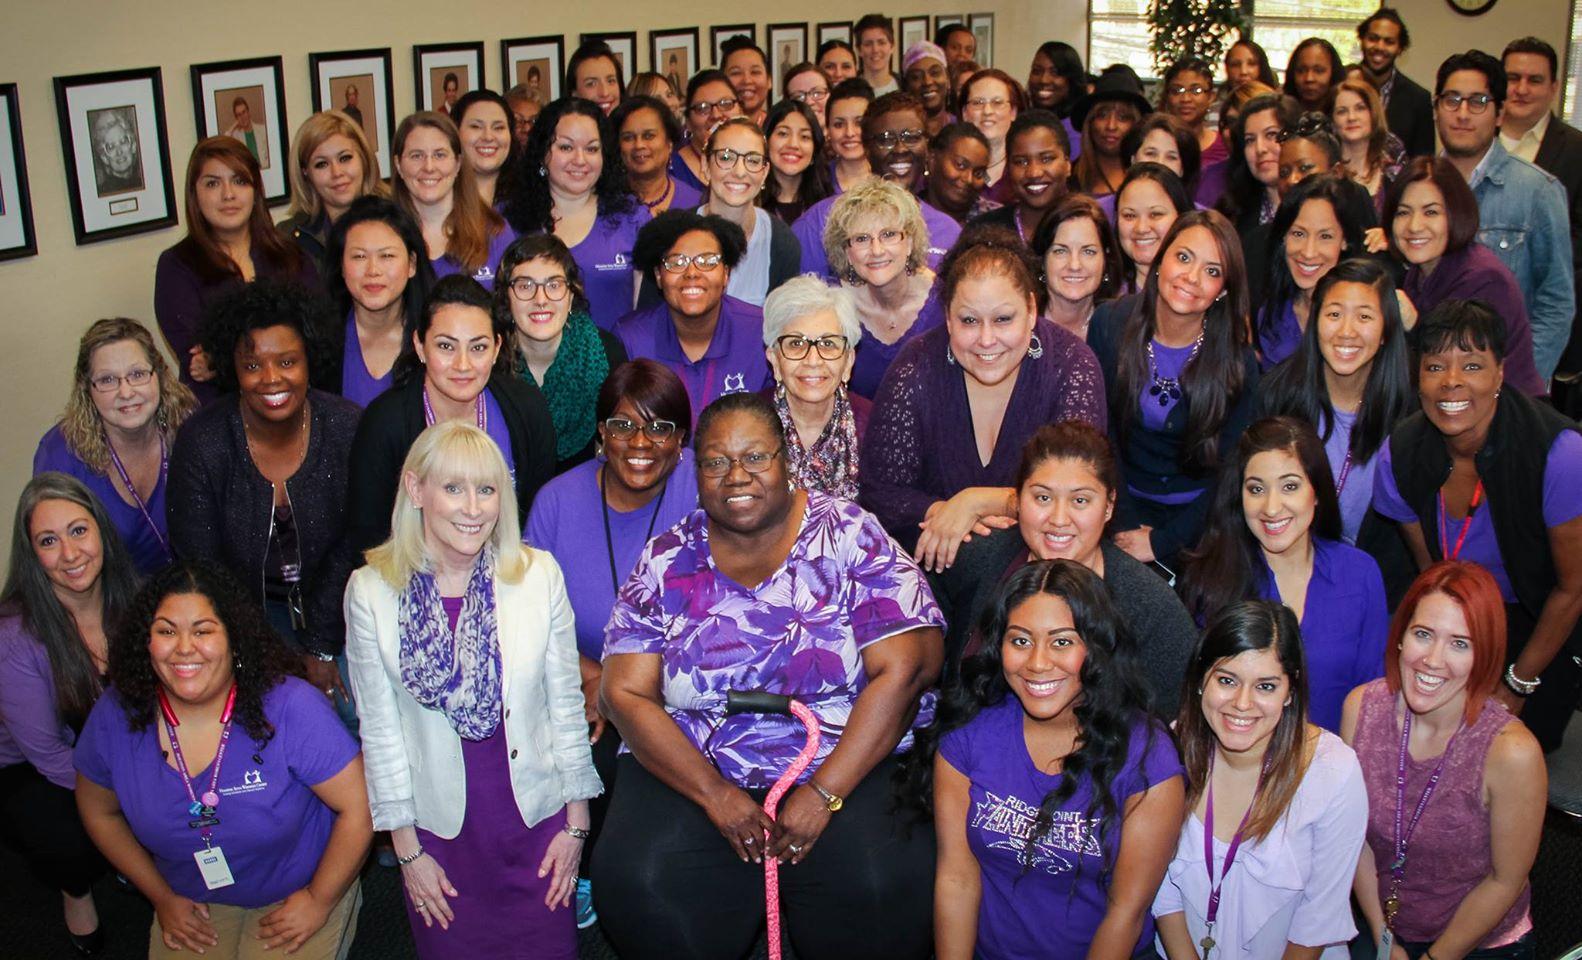 2016 Children's Health Fund Spotlight: Houston Area Women's Center